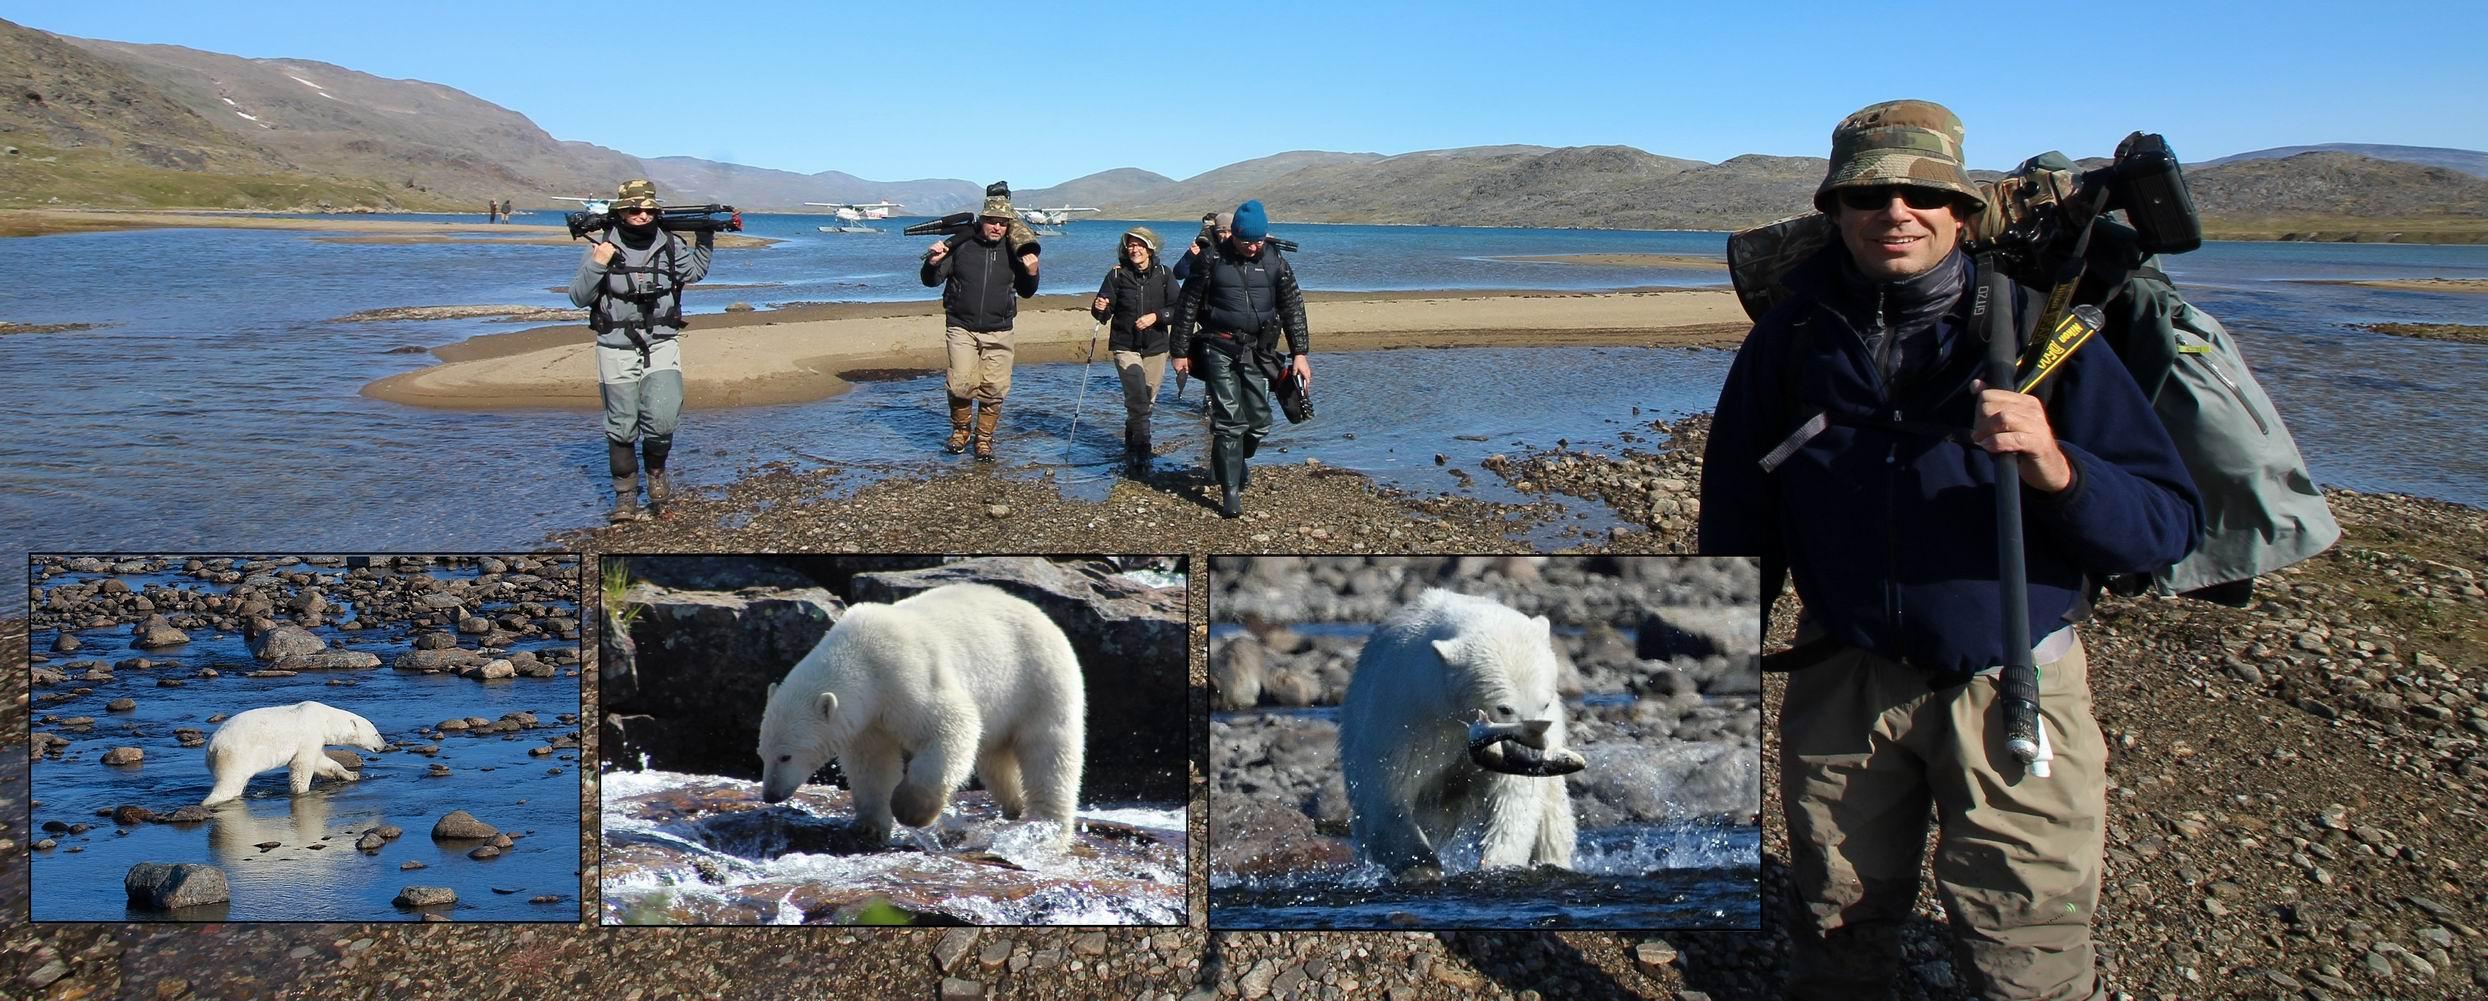 Polar Bear Watching in Labrador